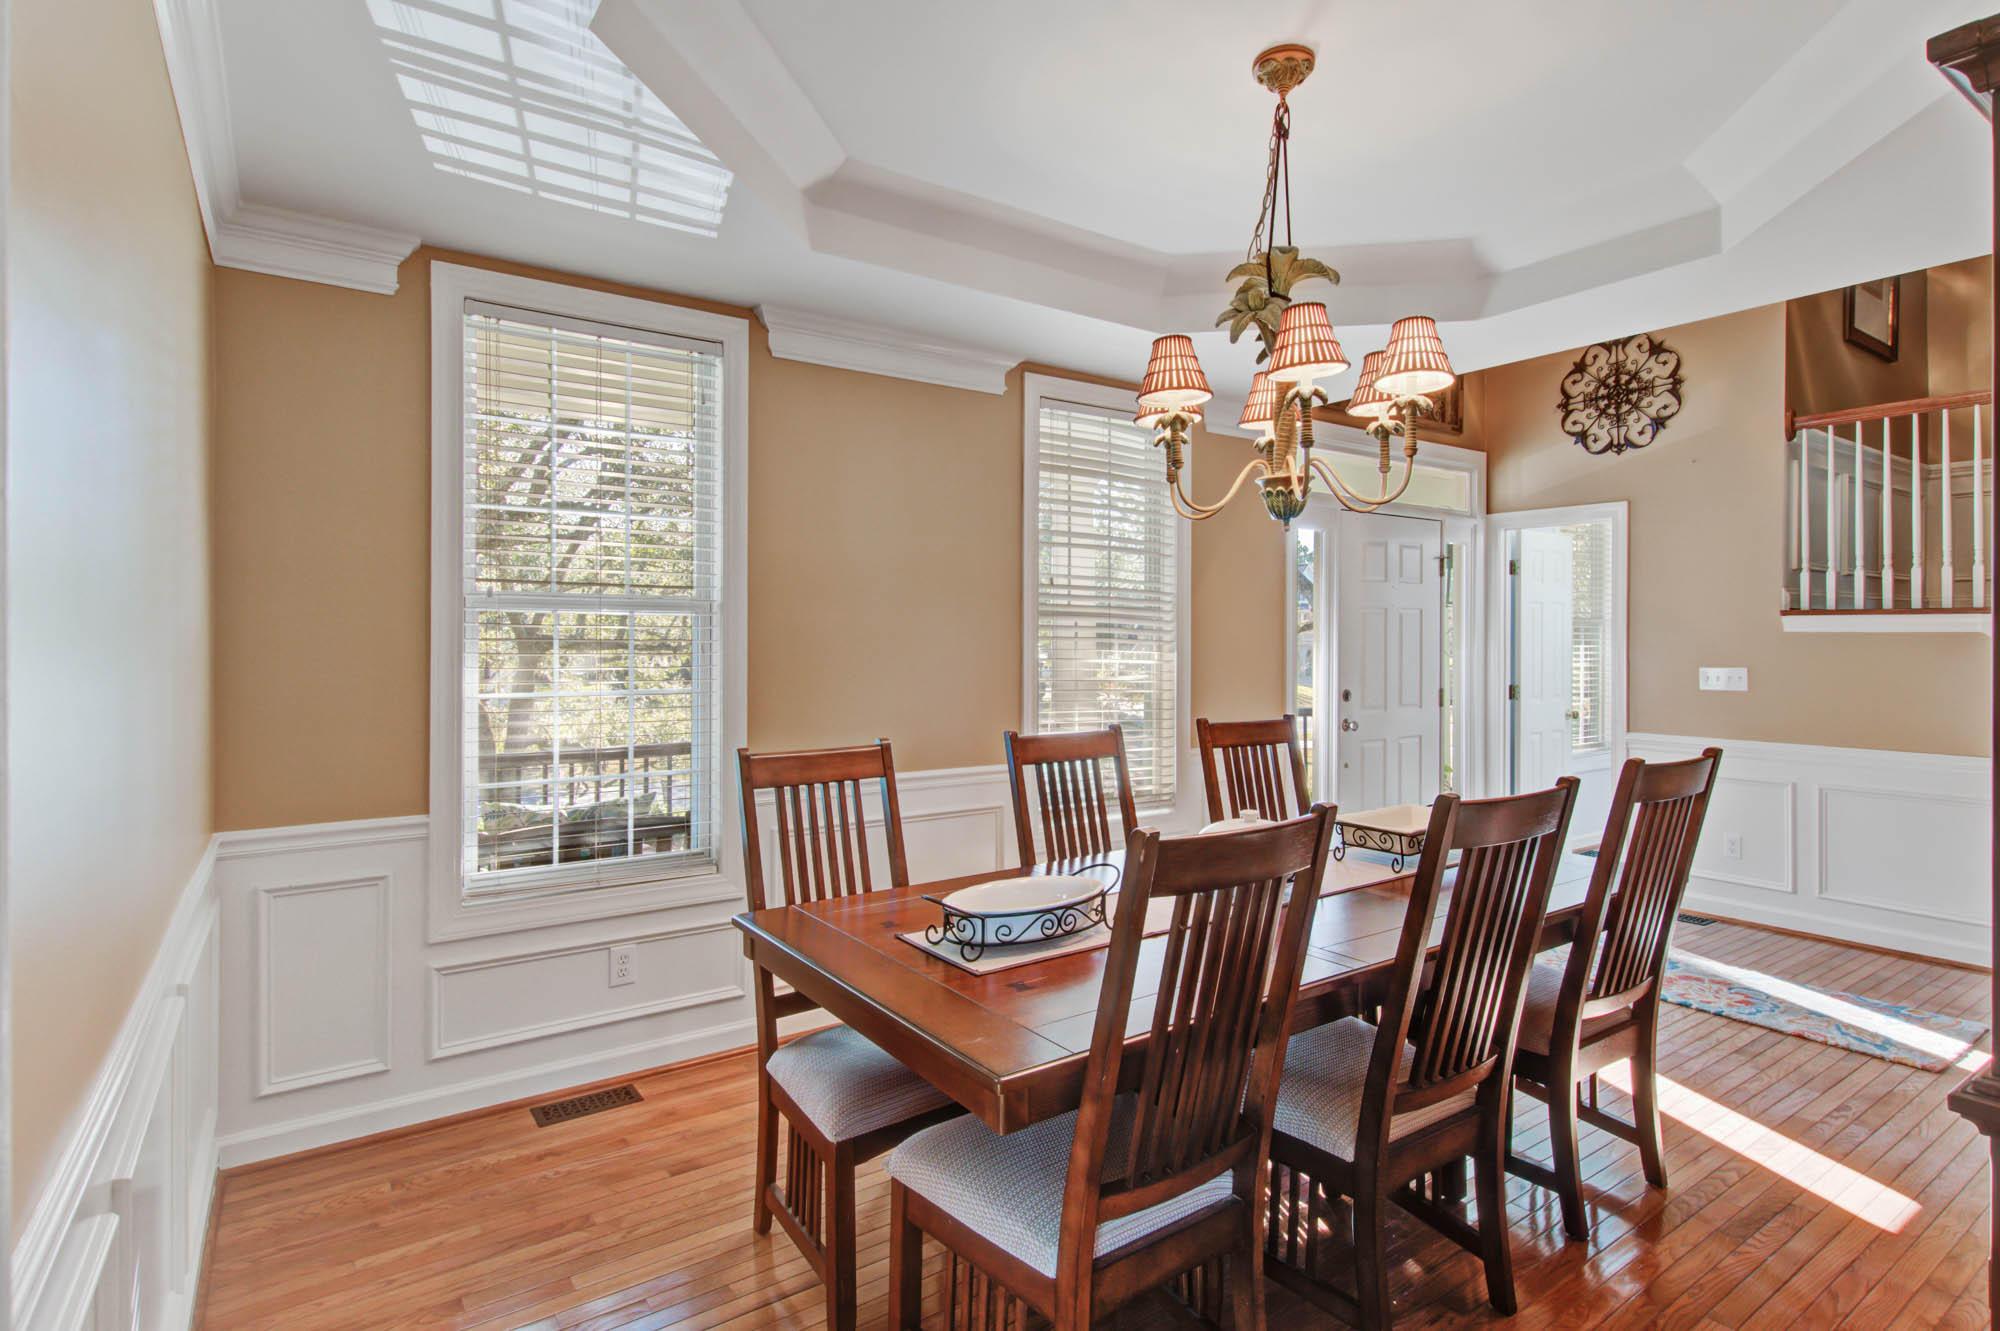 St Thomas Point Homes For Sale - 307 Jamesbury, Charleston, SC - 39